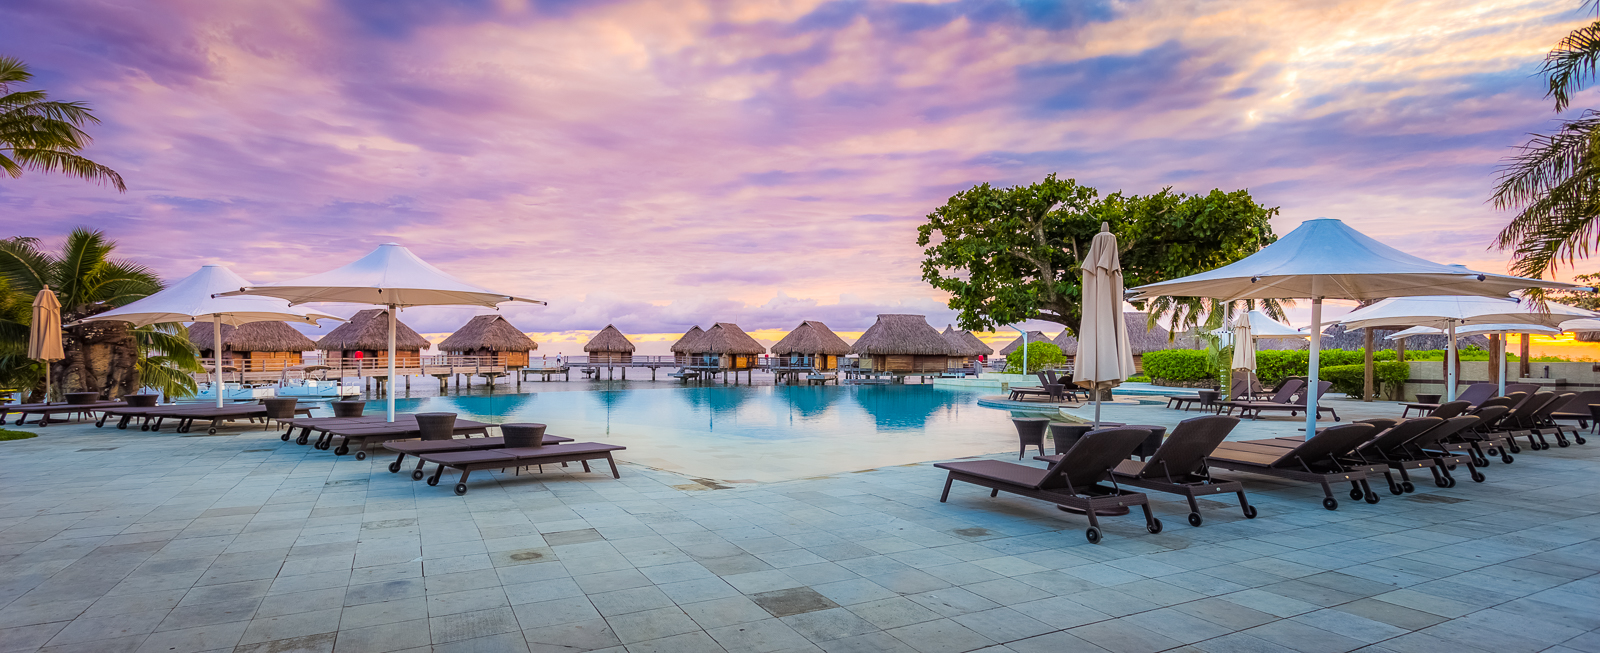 https://tahititourisme.nz/wp-content/uploads/2019/01/Moorea-Pearl-Resort-®-Charles-Veronese-30.jpg